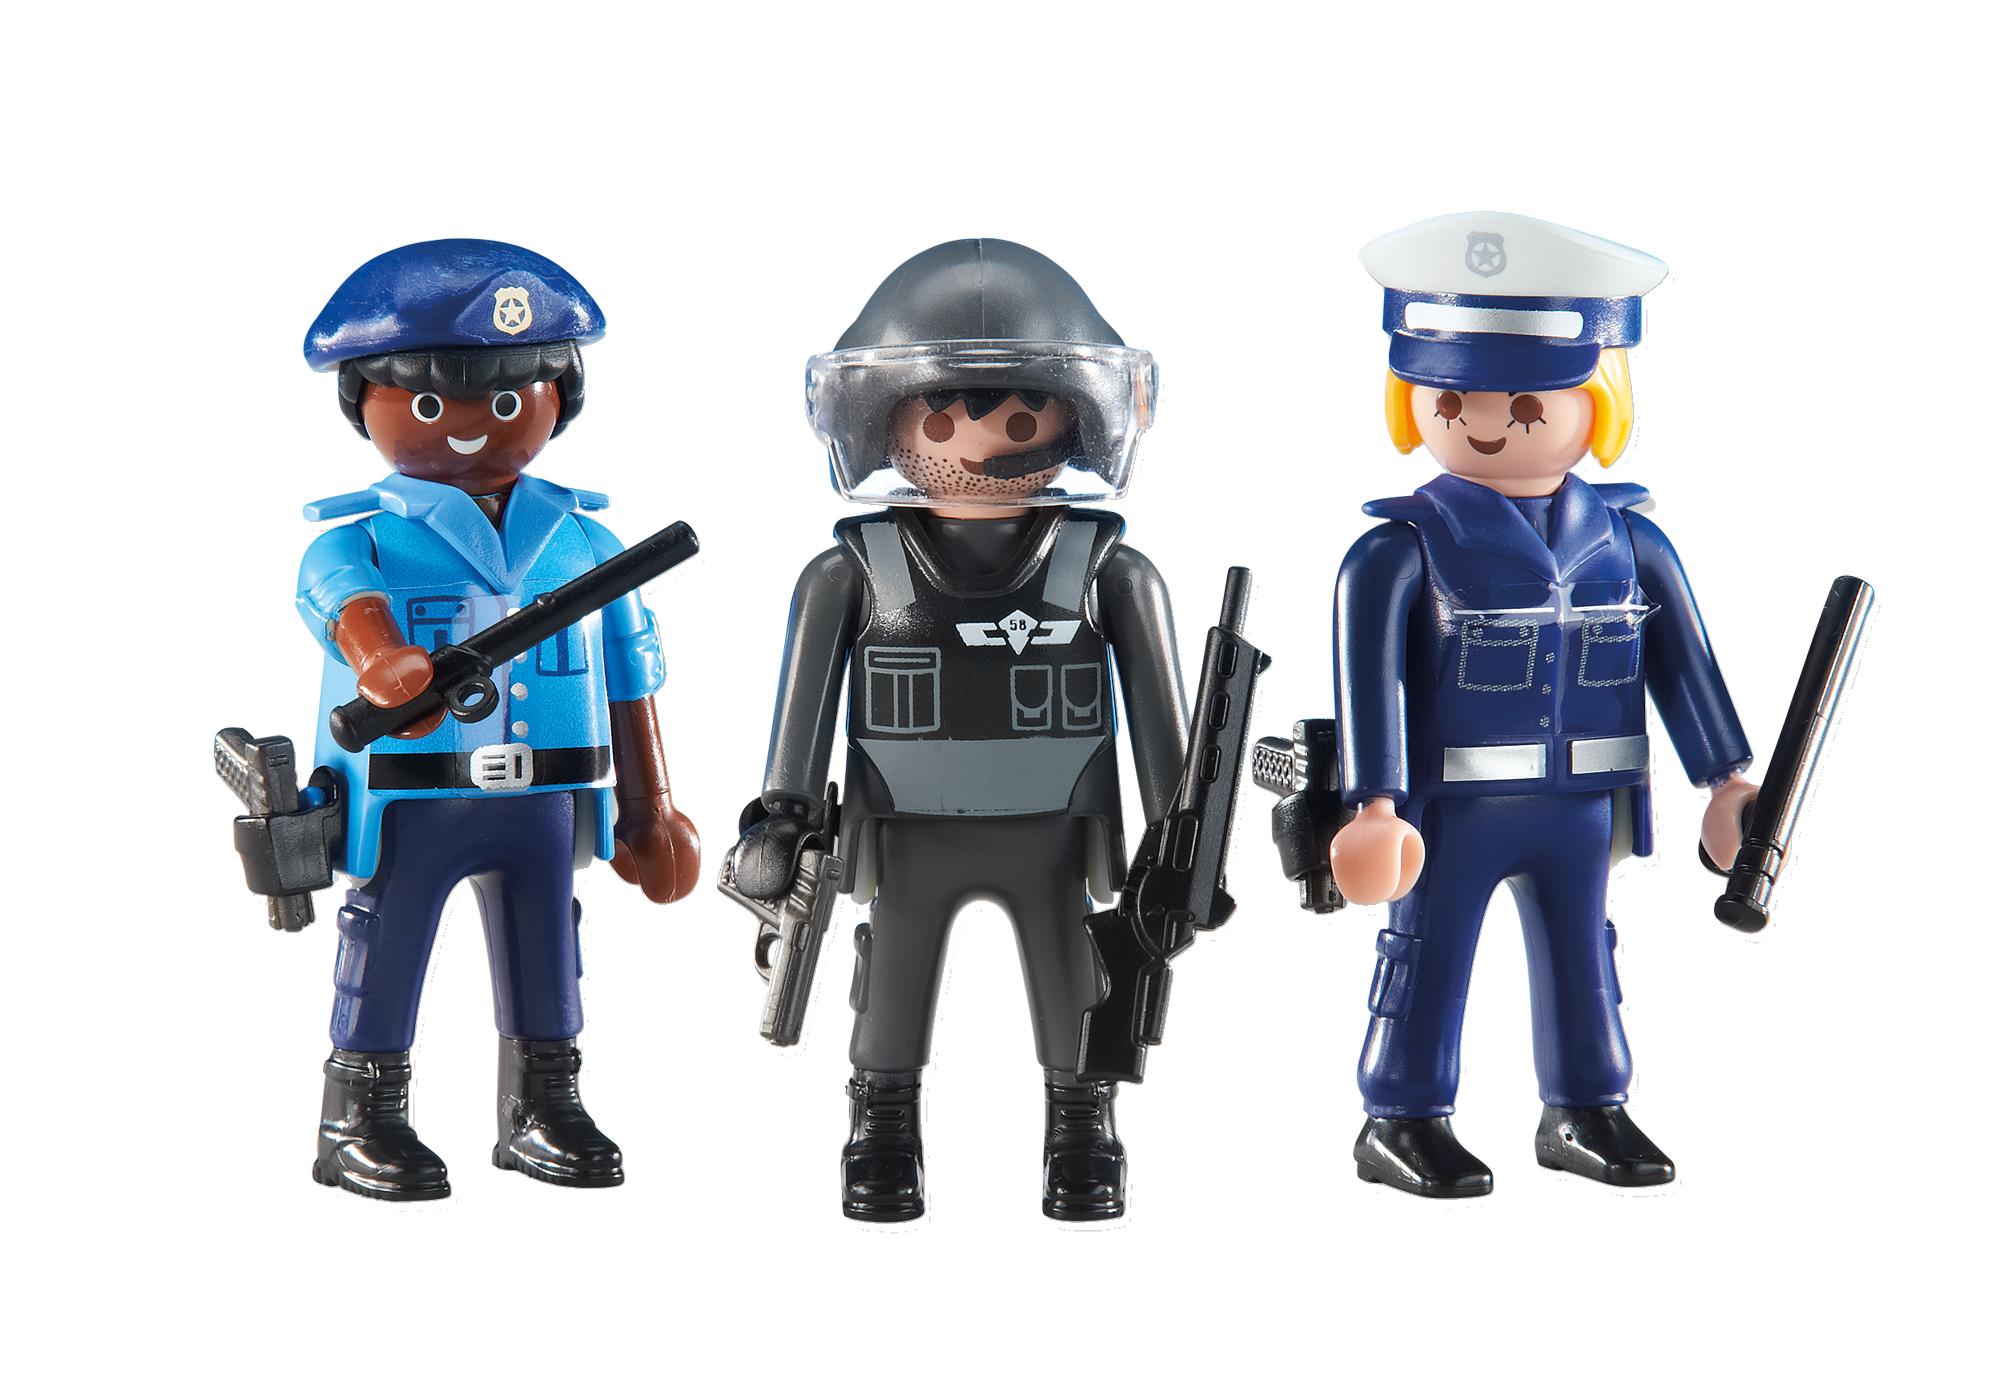 6501_product_detail/Τρεις αστυνομικοί